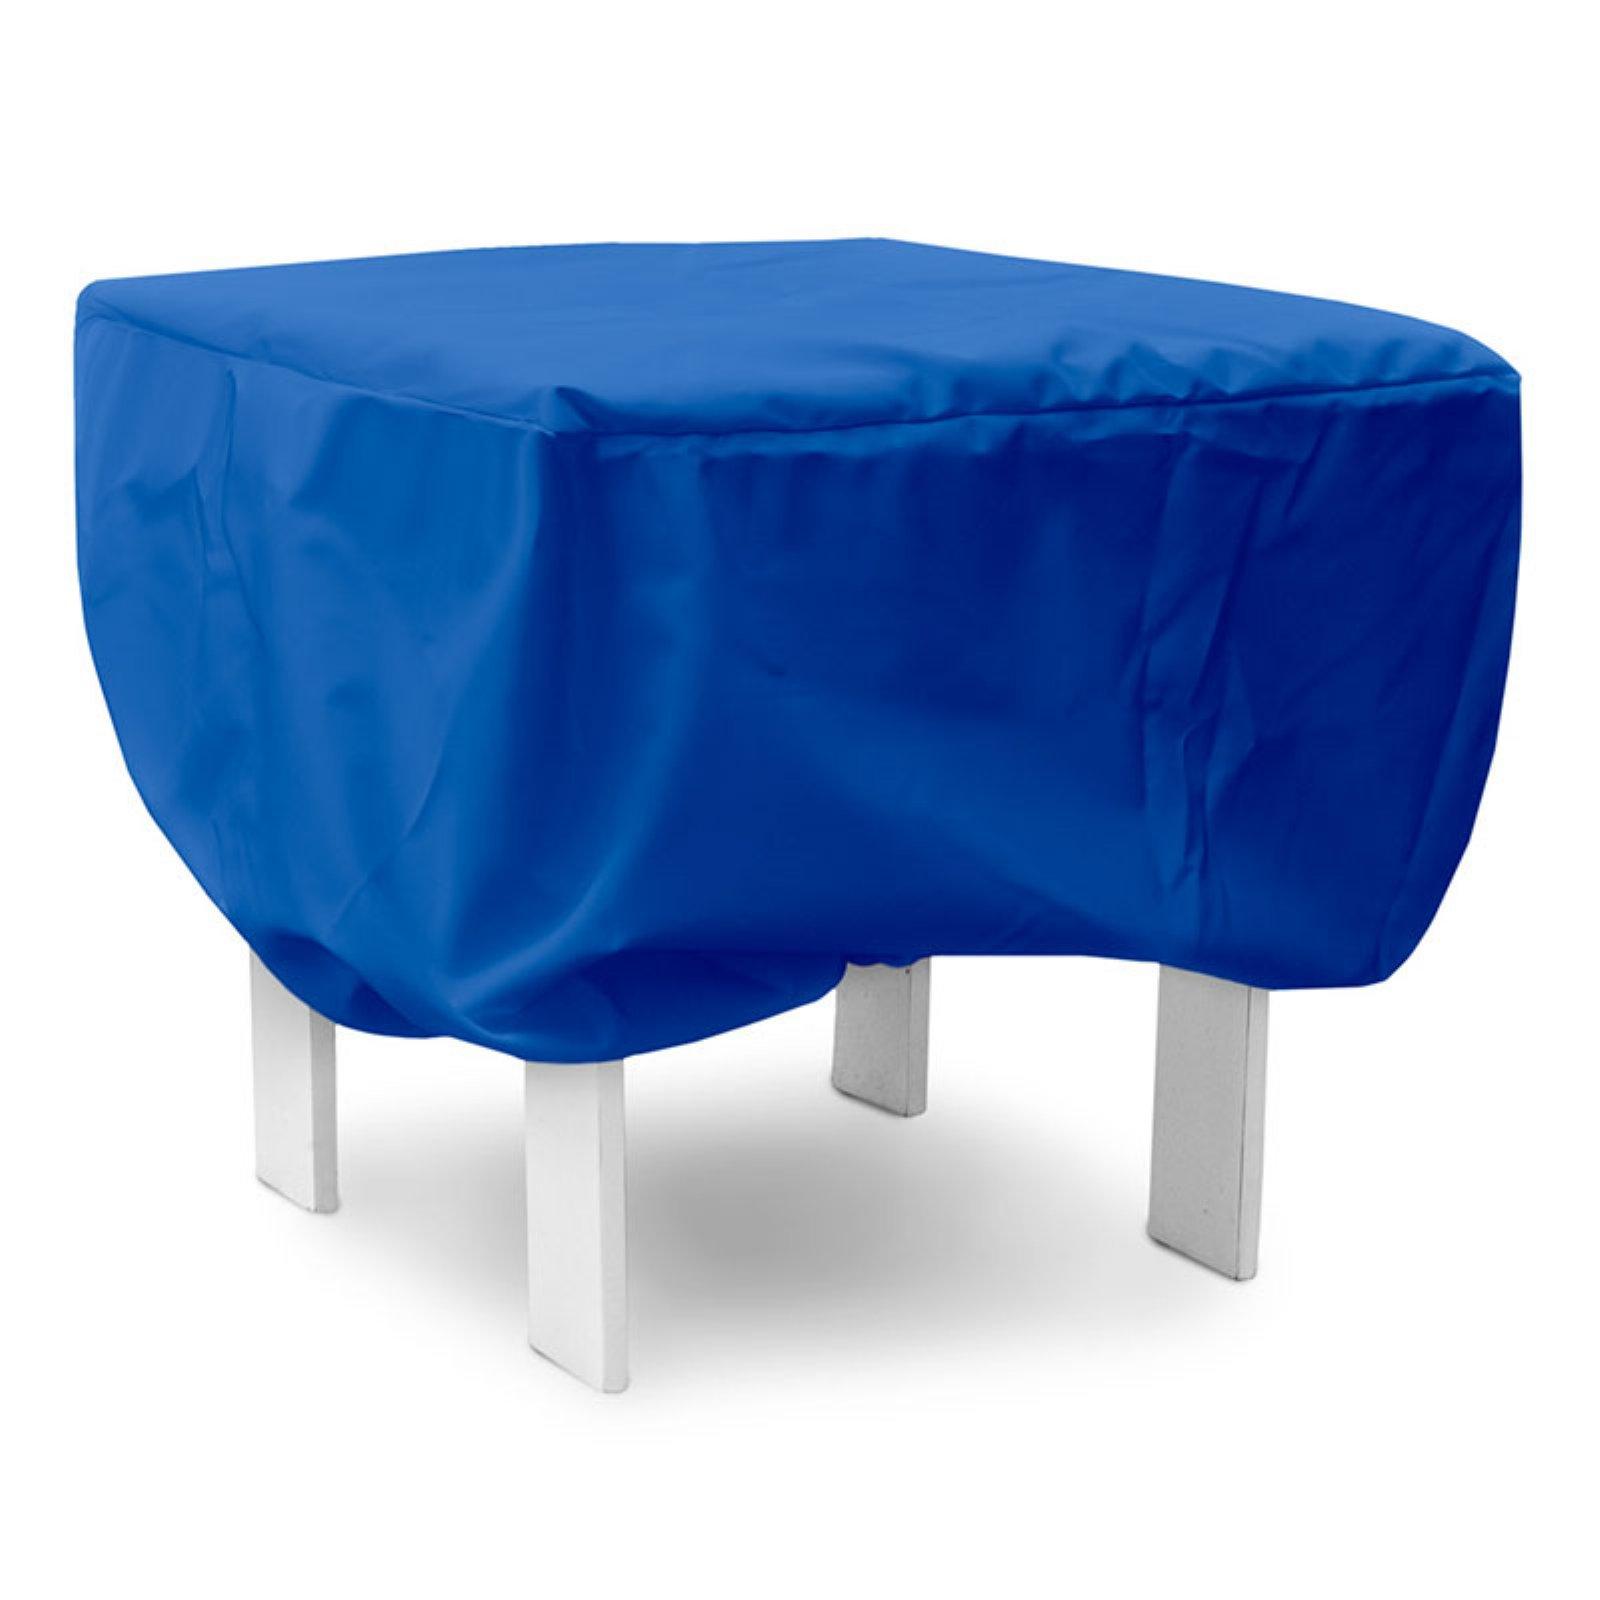 KoverRoos Weathermax Square Ottoman / Small Table Cover